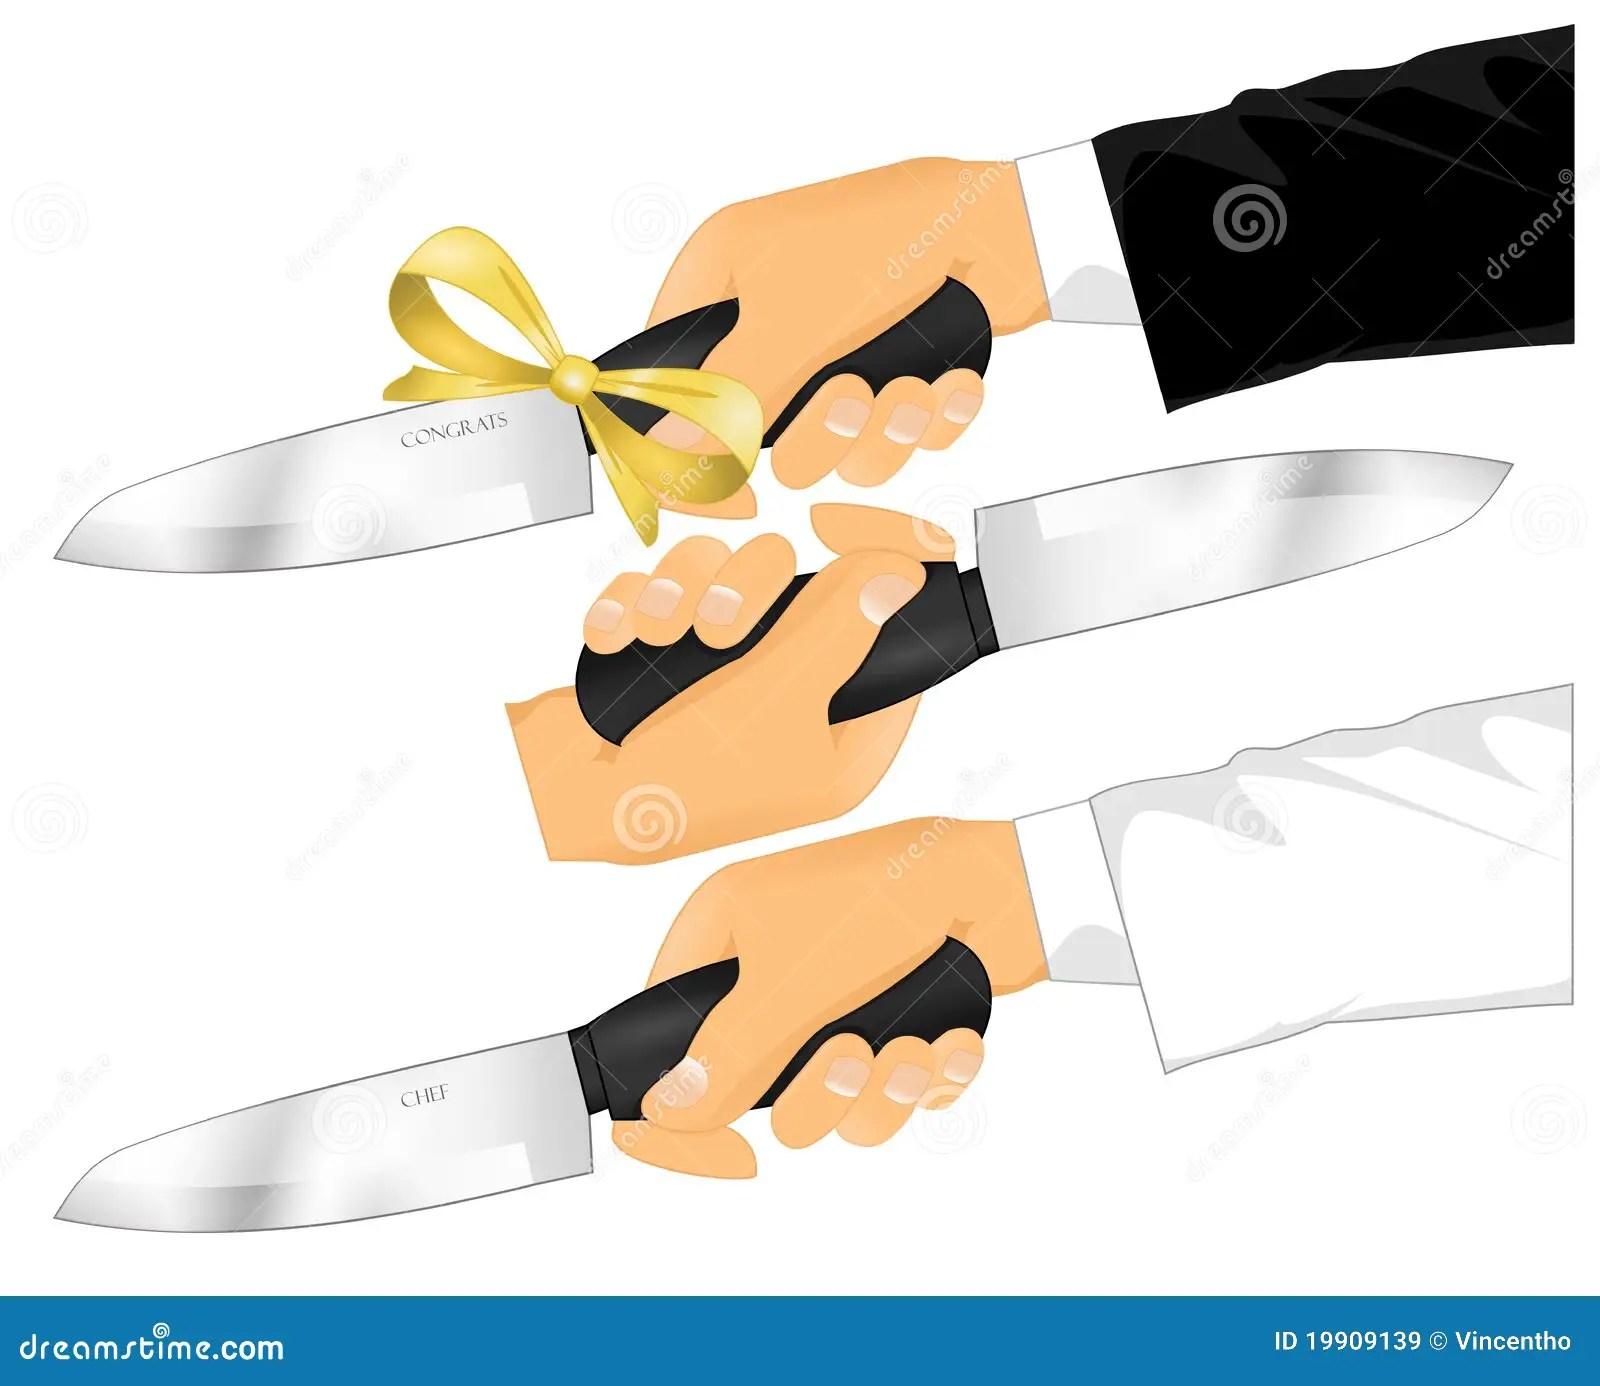 Kitchen Knife Holding Pose